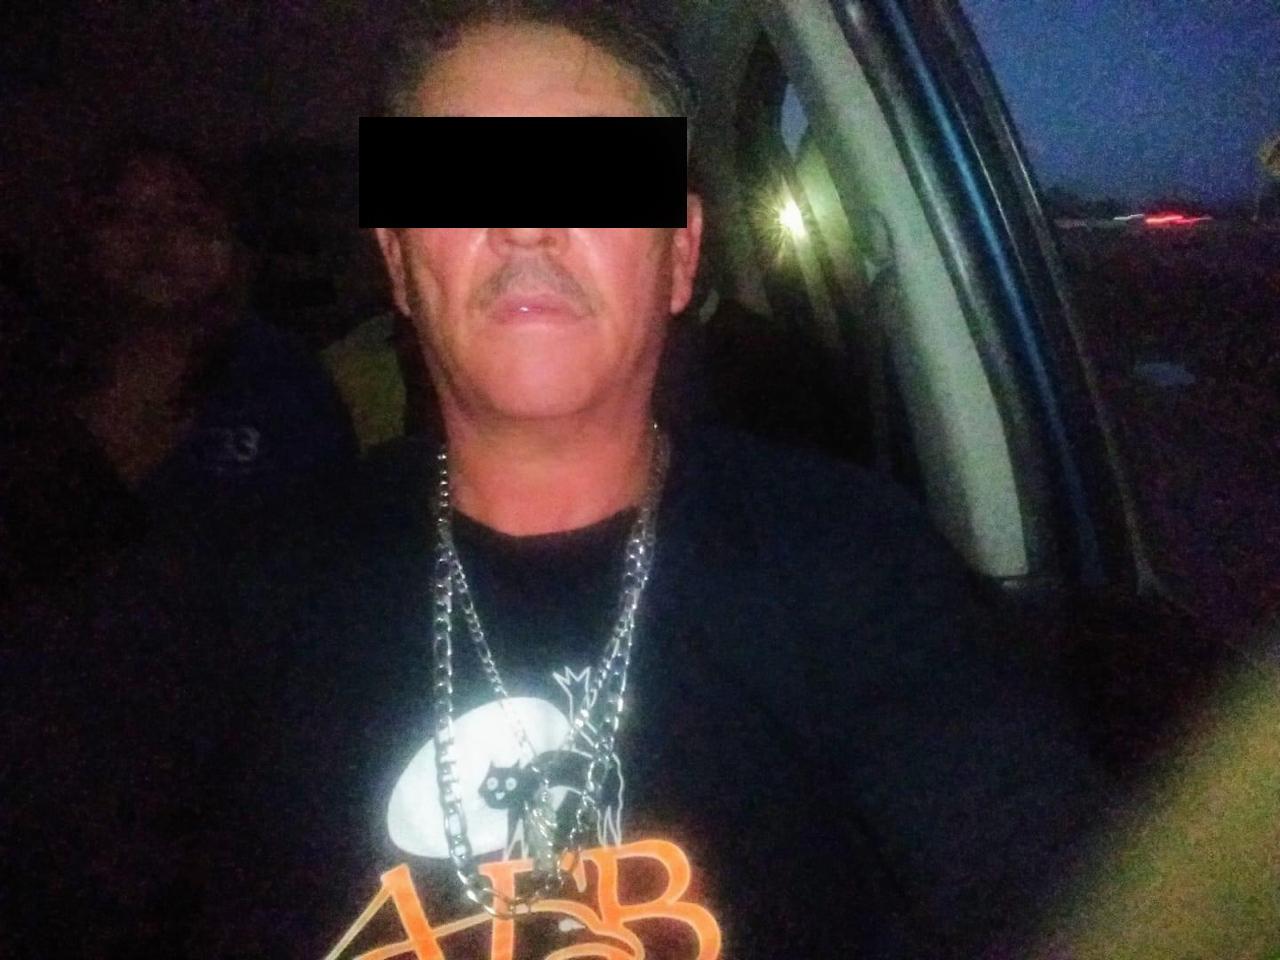 Mandan al C4 a presunto abusador en Monclova